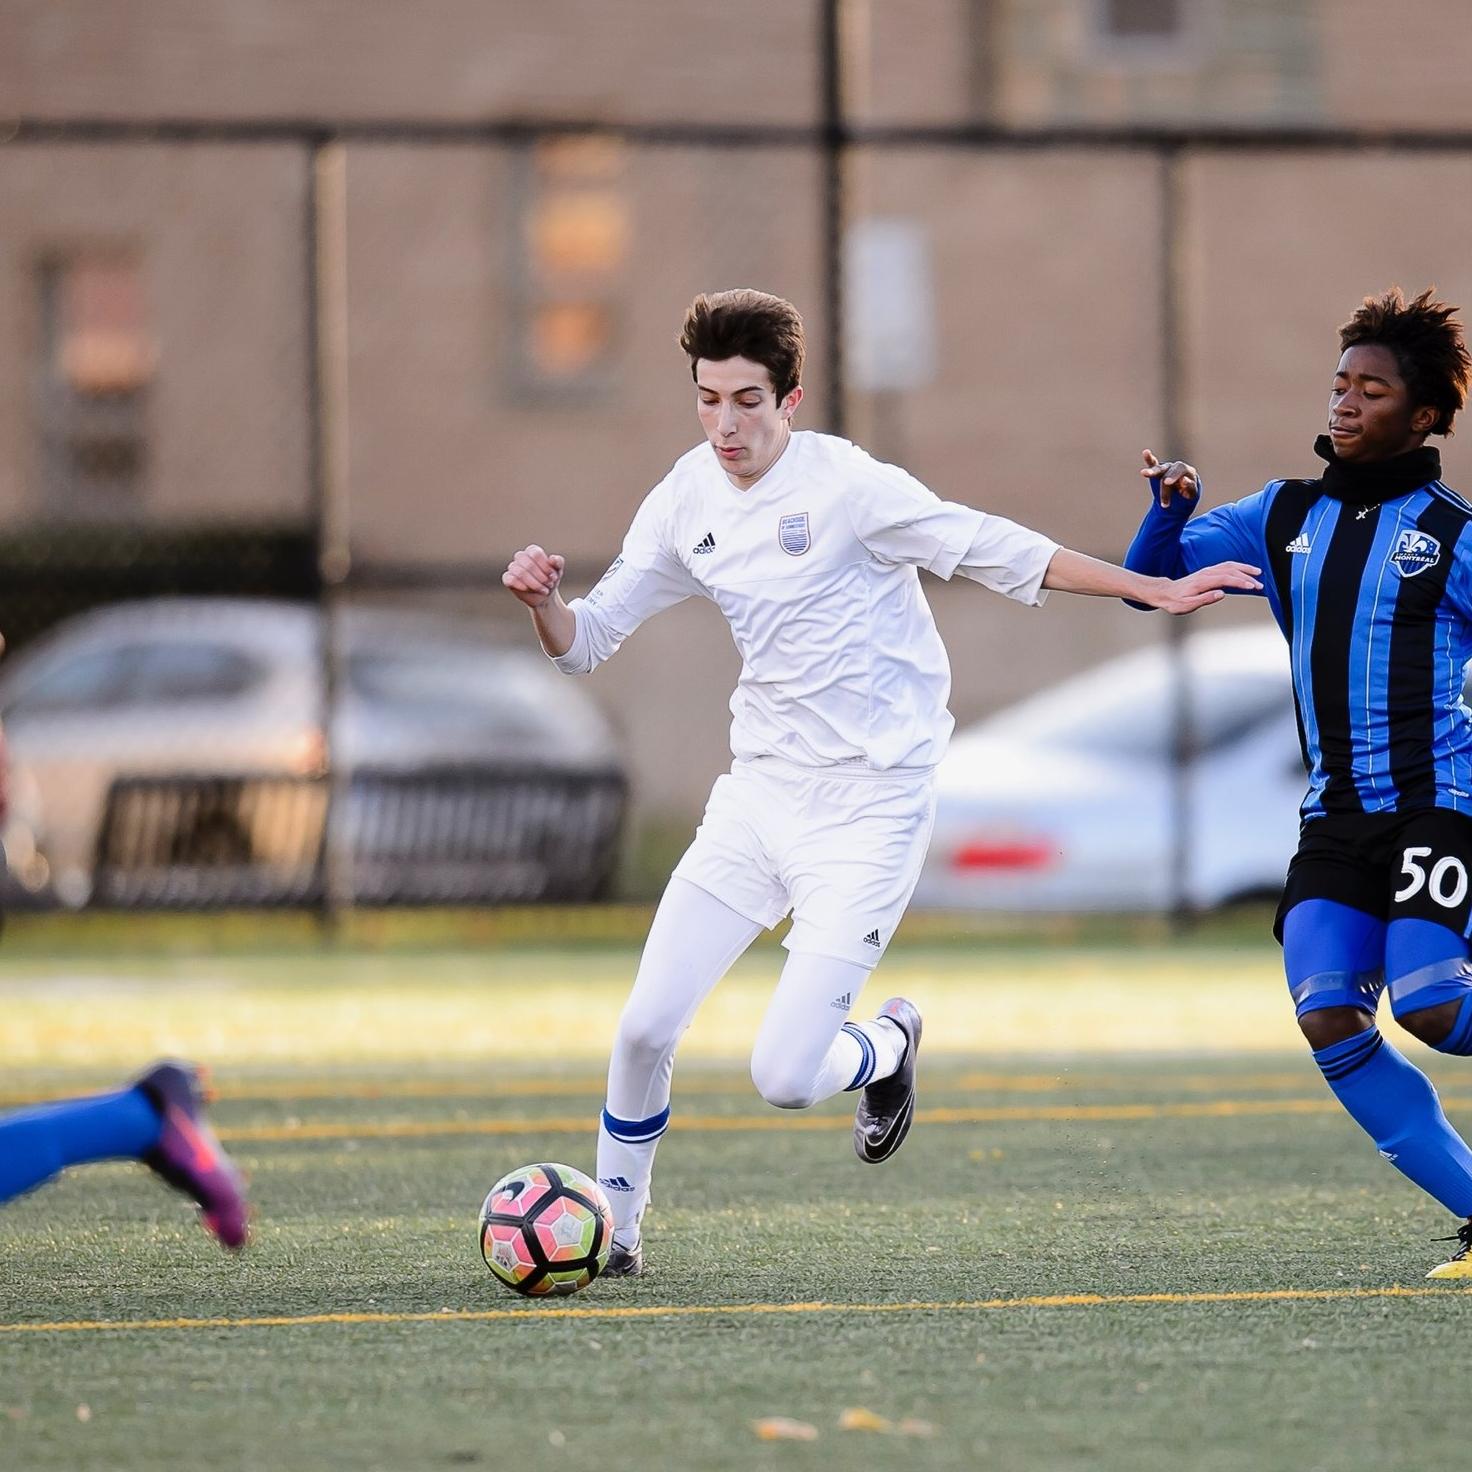 Austin Sholes   Soccer